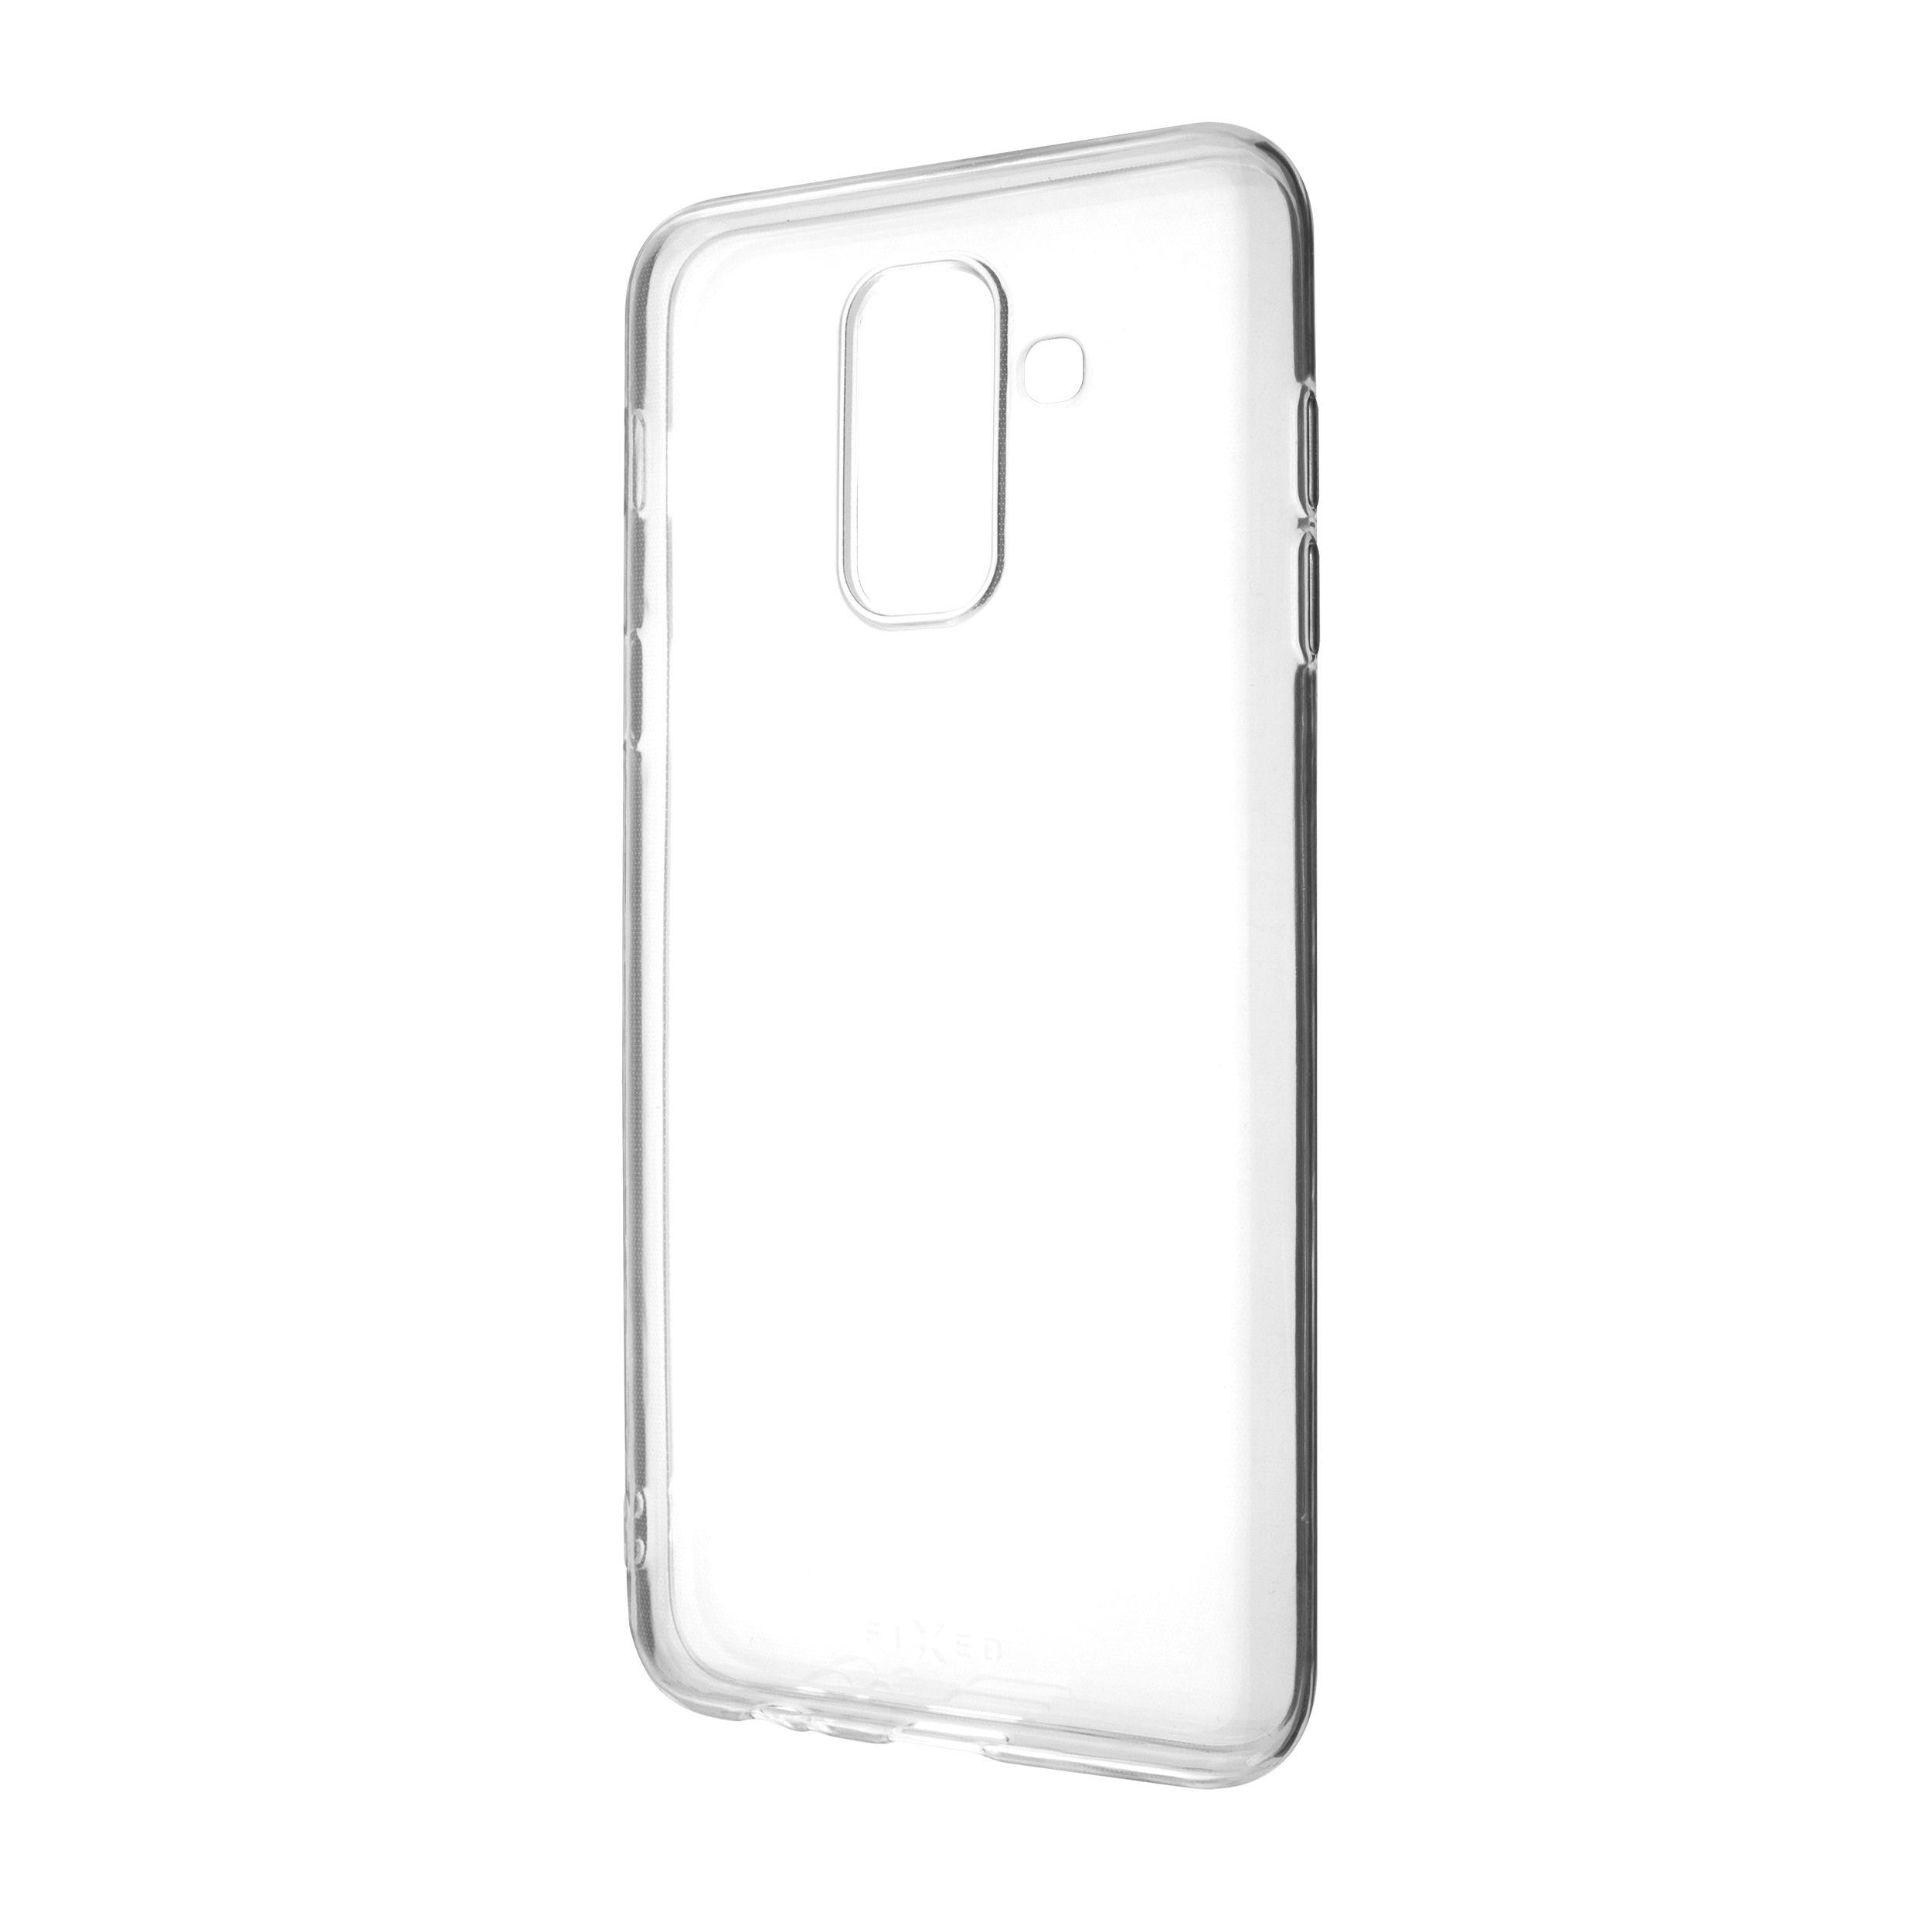 TPU gelové pouzdro FIXED pro Samsung Galaxy A6+ (2018), čiré